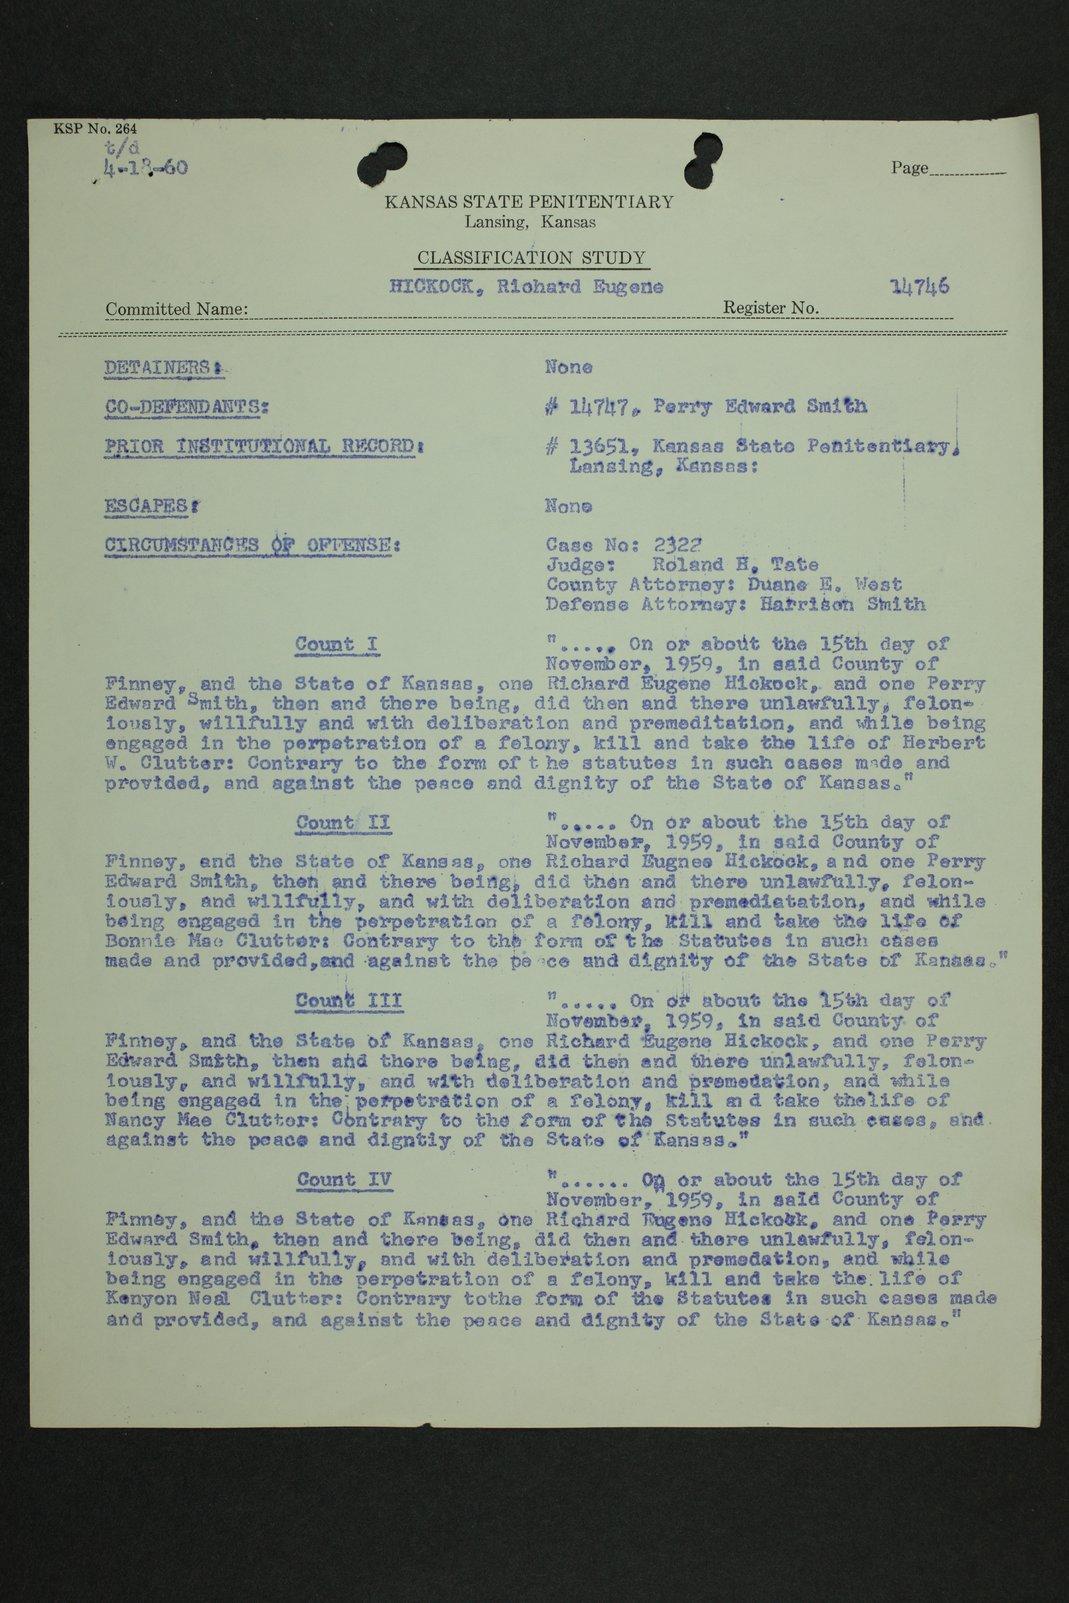 Richard Eugene Hickock inmate case file - 7